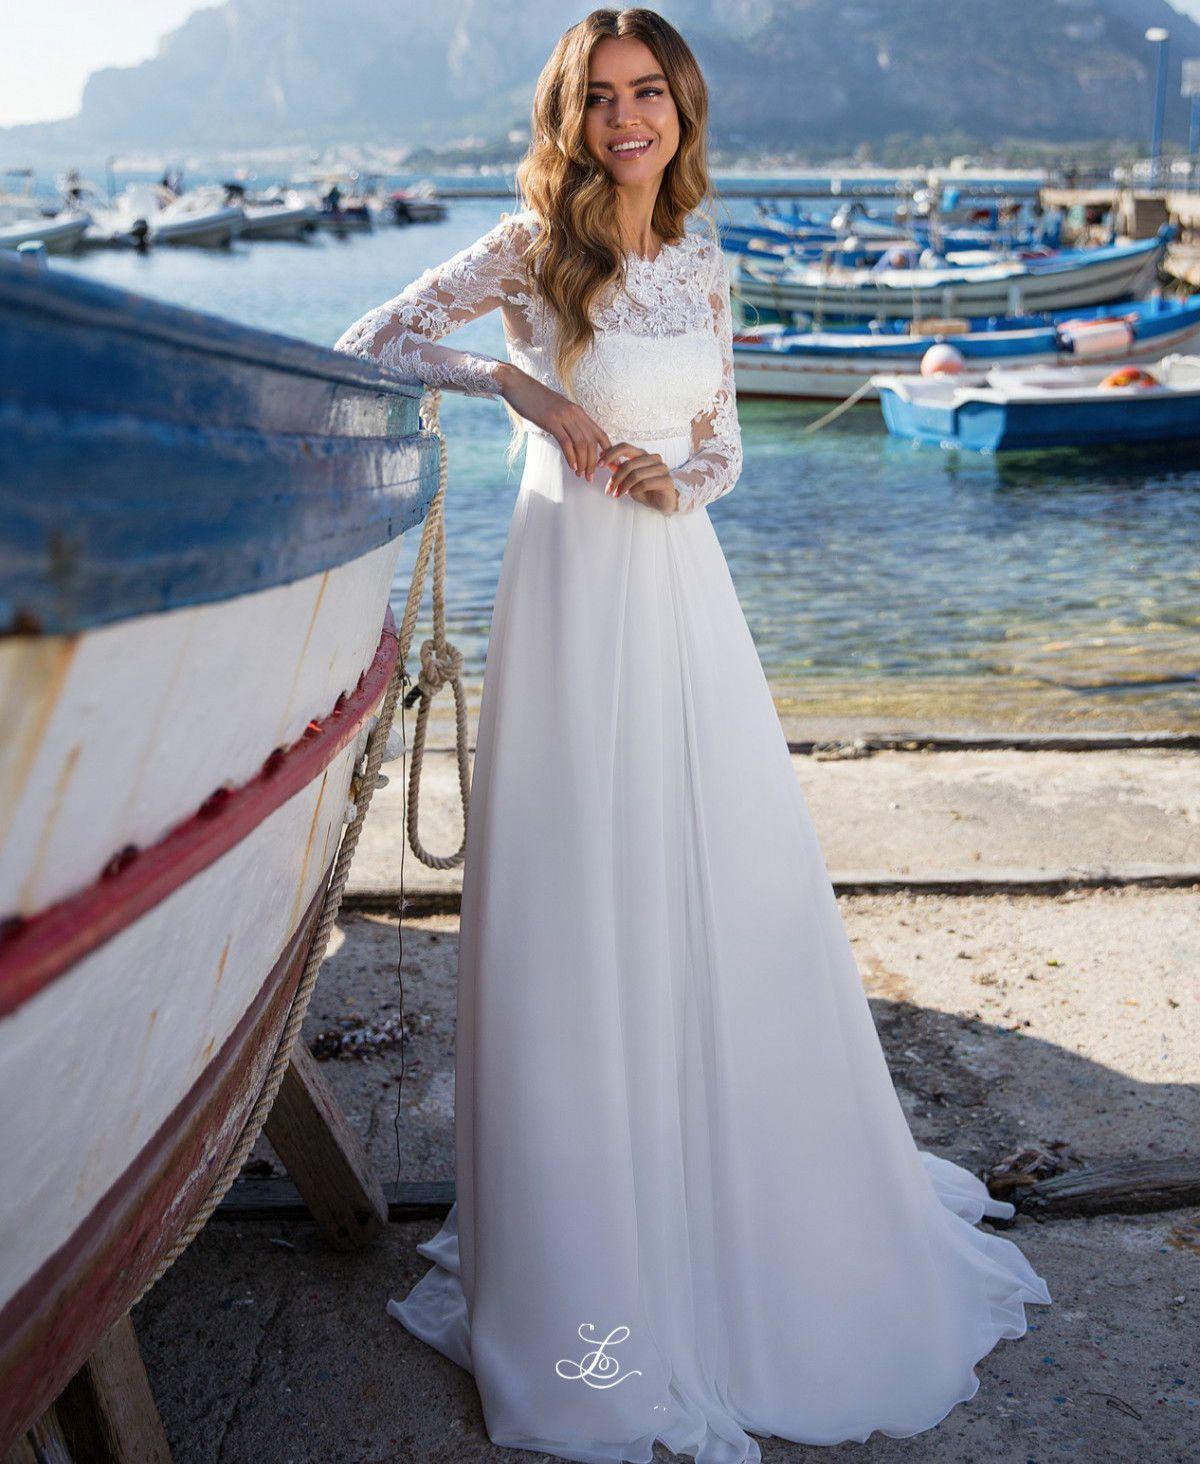 New Design Beach Wedding Dresses 2020 Bateau Neck Long Sleeves Chapel Train Lace Satin Bride Gowns Vestido de noiva longo Robe de mariee